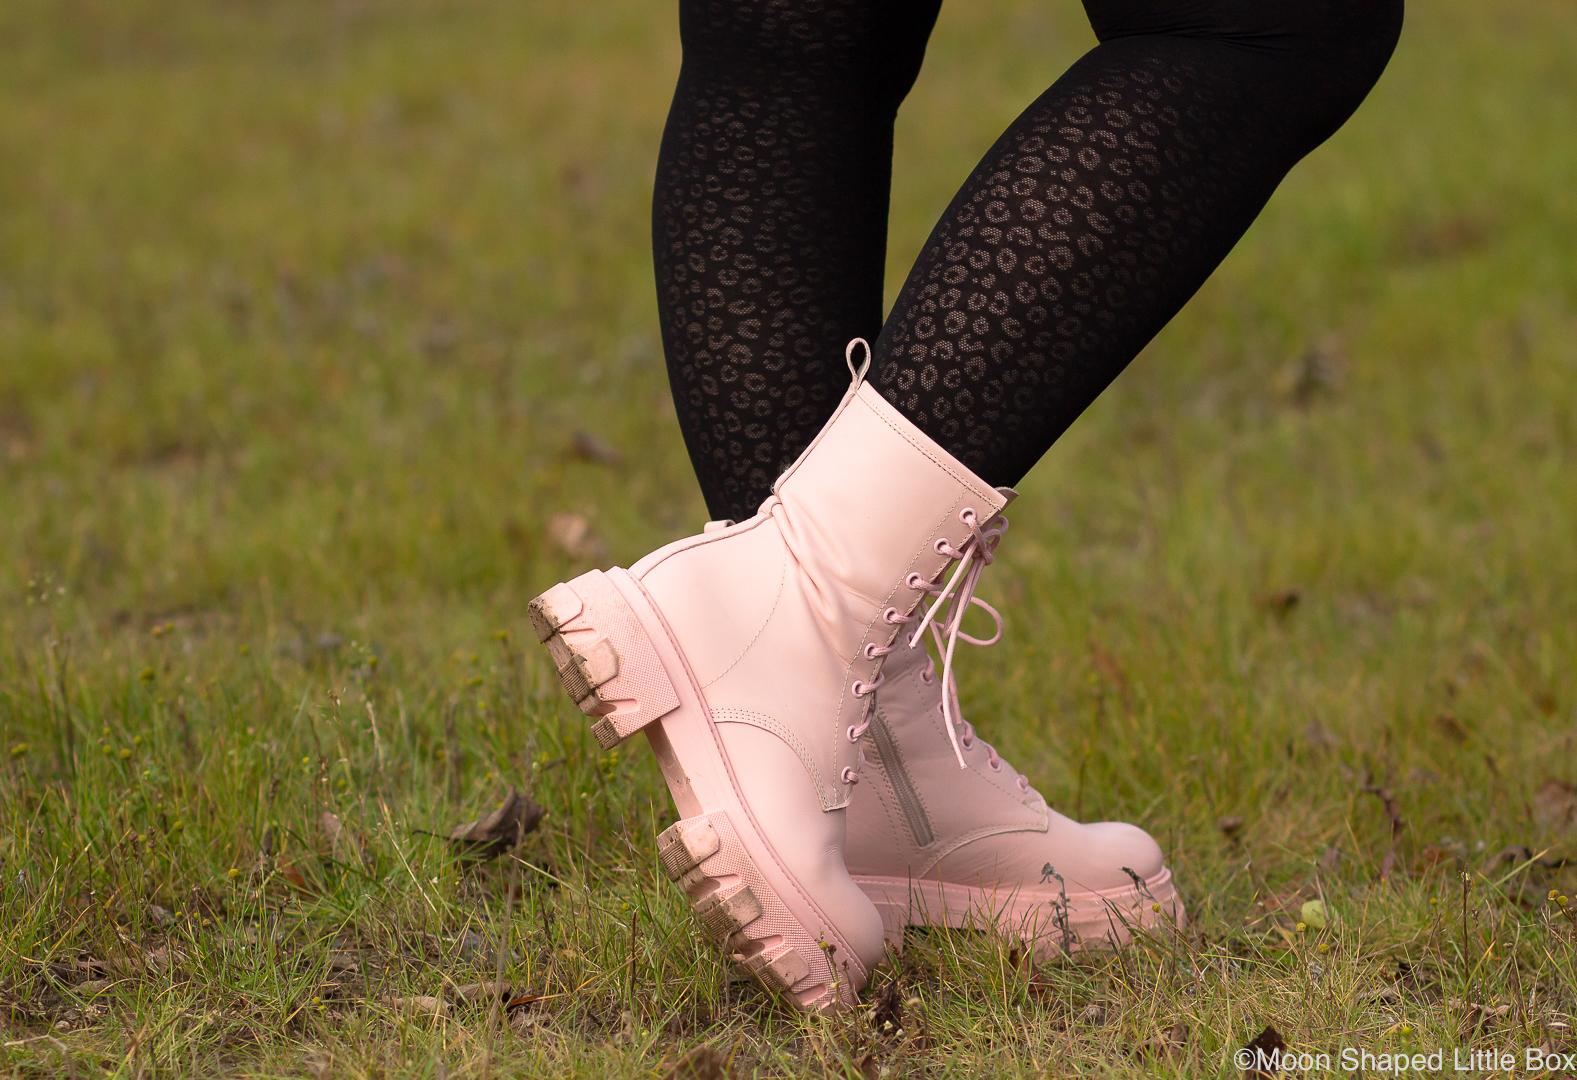 Vaaleanpunaiset-maiharit